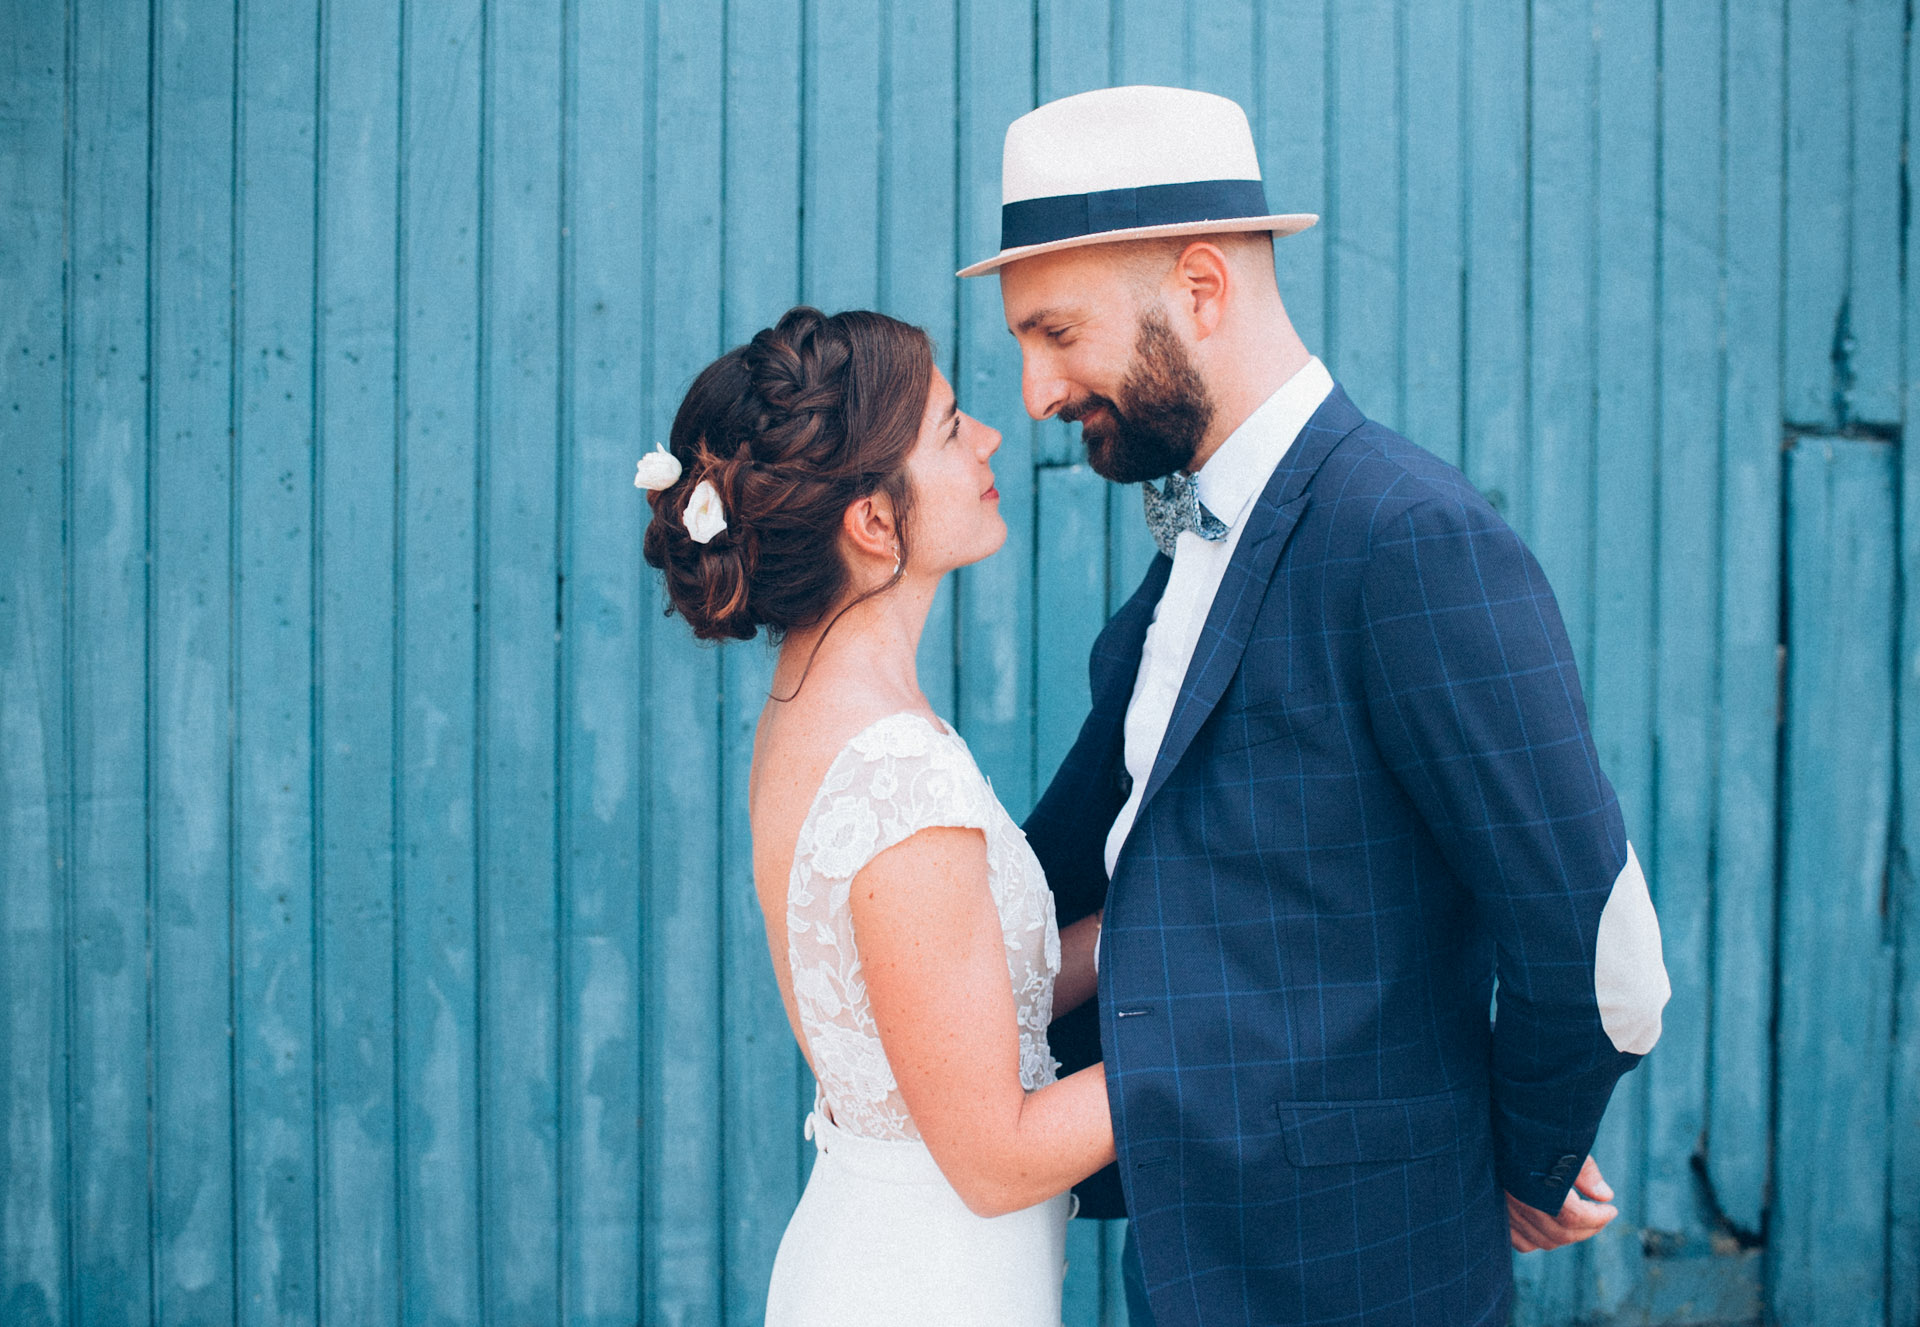 Christophe ROLAND / photographe lifestyle / Photographe meaux / Paris / meaux / photographe mariage / photographe seine et marne